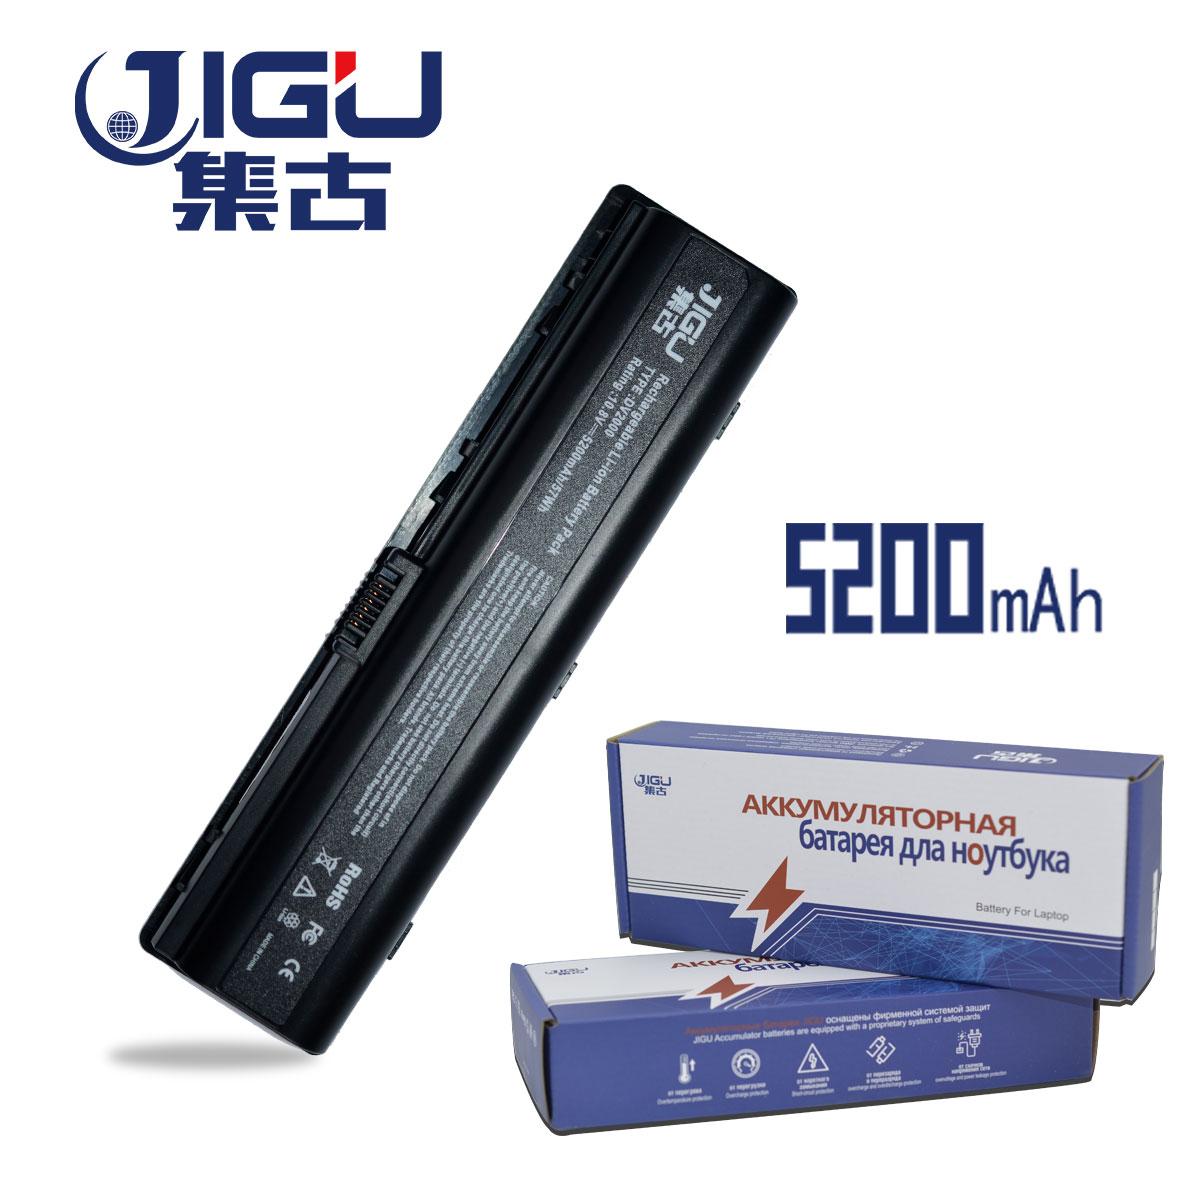 JIGU новый ноутбук Батарея для hp COMPAQ Presario C700 V3000 F500 DV2000 HSTNN-DB42 HSTNN-LB42 HSTNN-LB42 HSTNN-OB31 ...